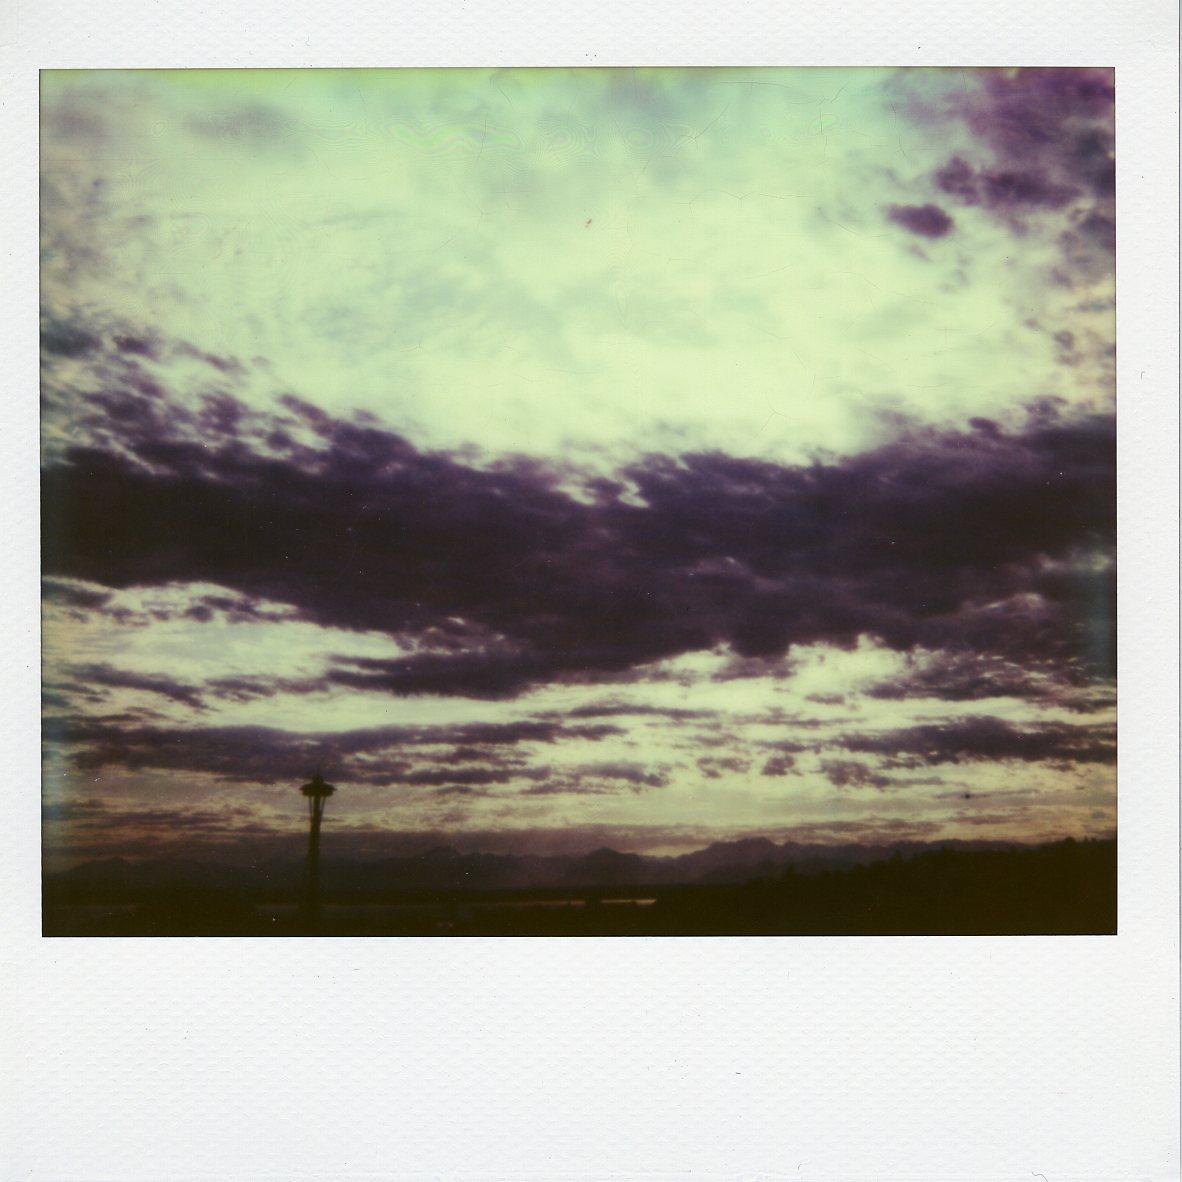 polaroid_roidweek004.jpg